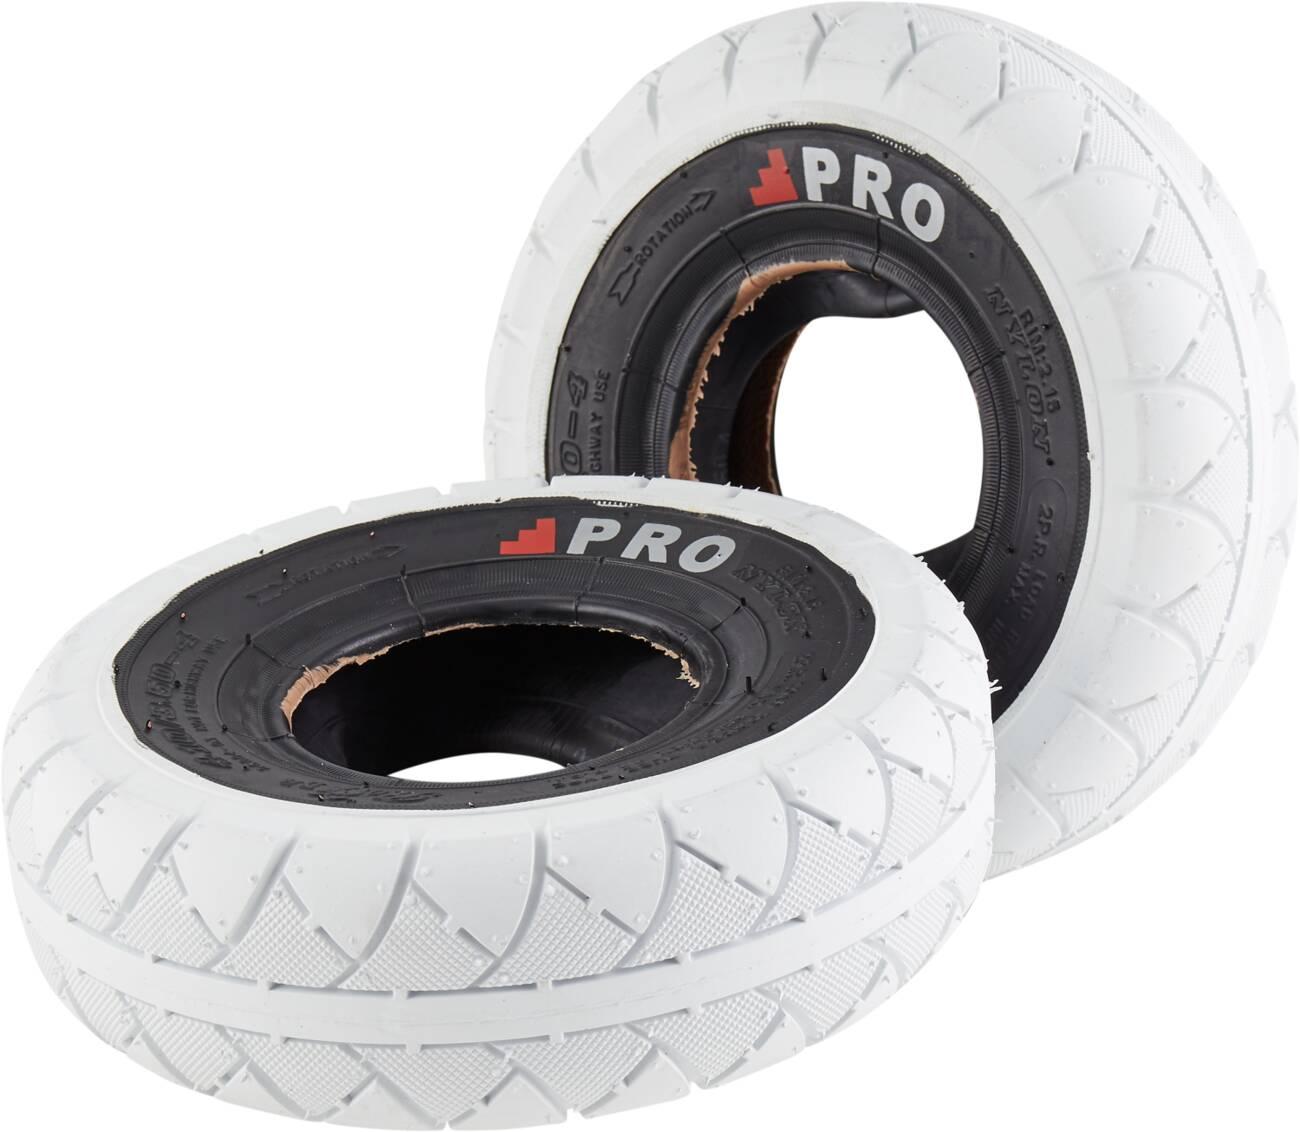 sportstoys.se-rocker-street-pro-mini-bmx-tires-lf-vitsvart